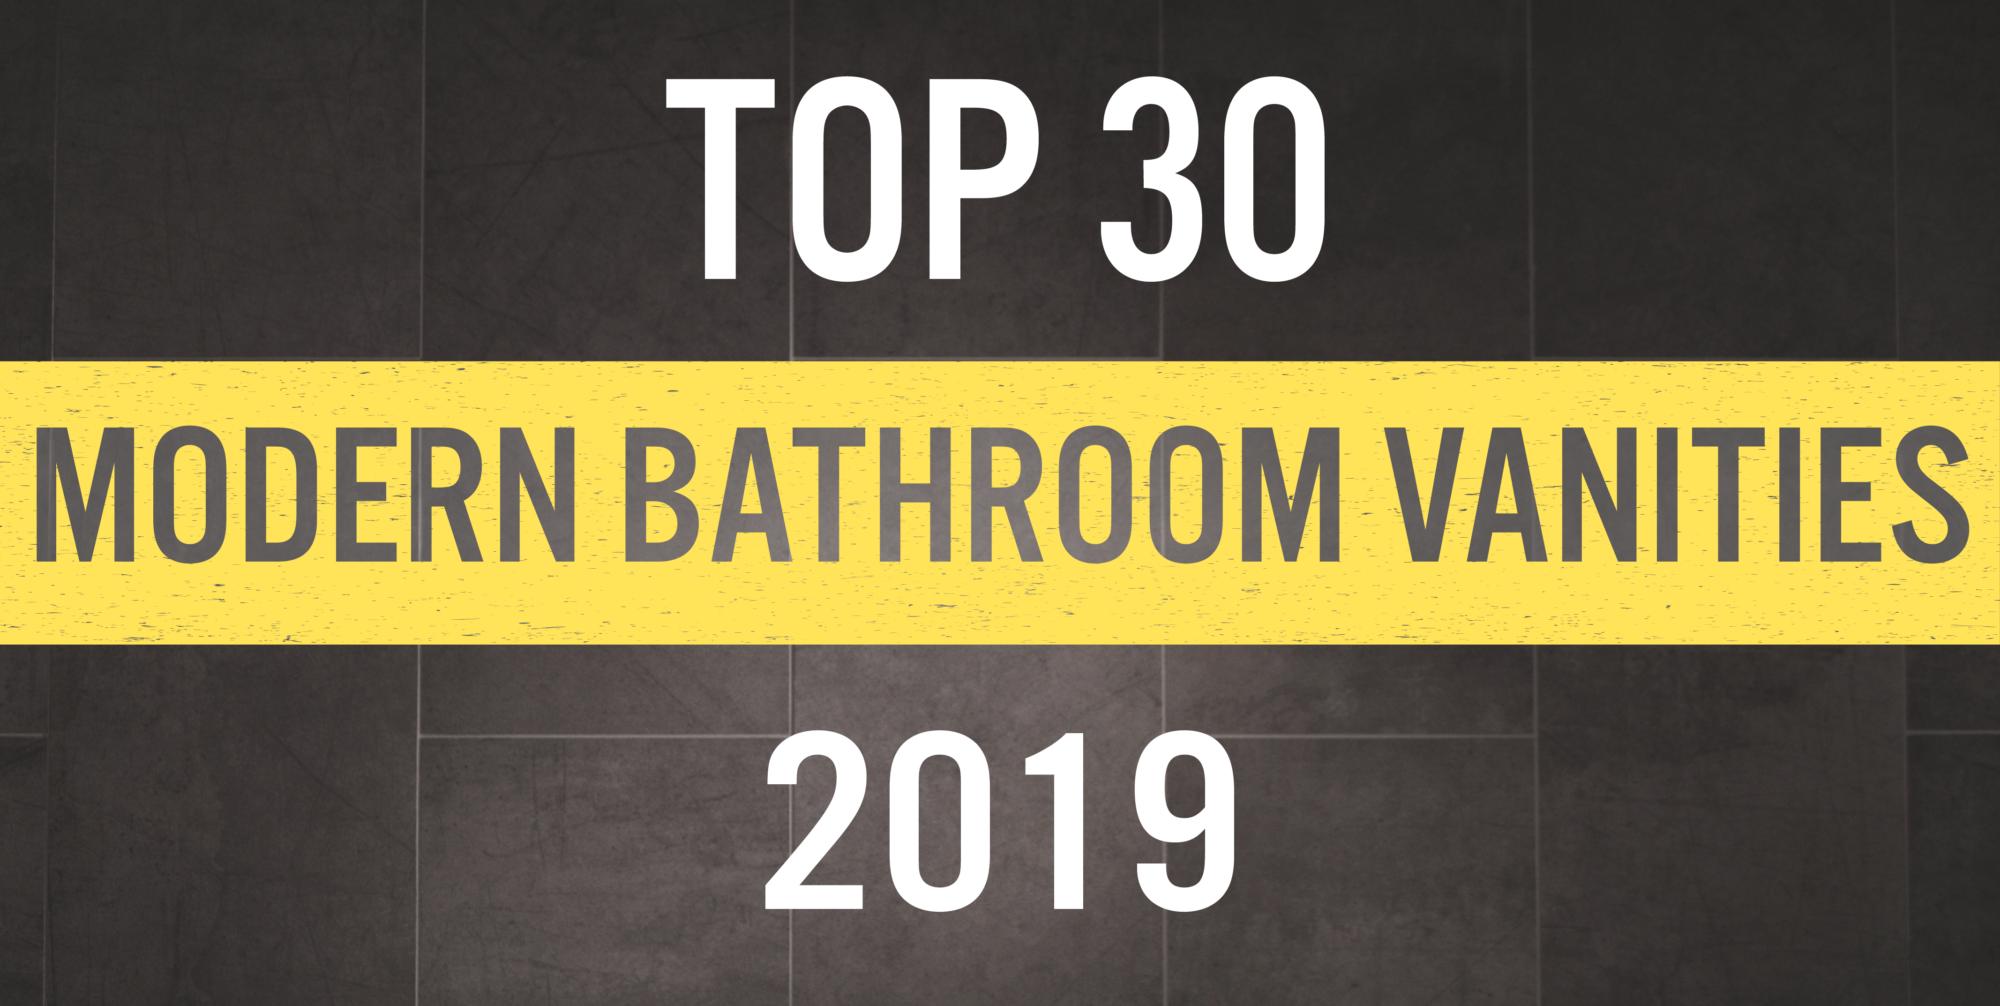 The 30 Best Modern Bathroom Vanities of 2019